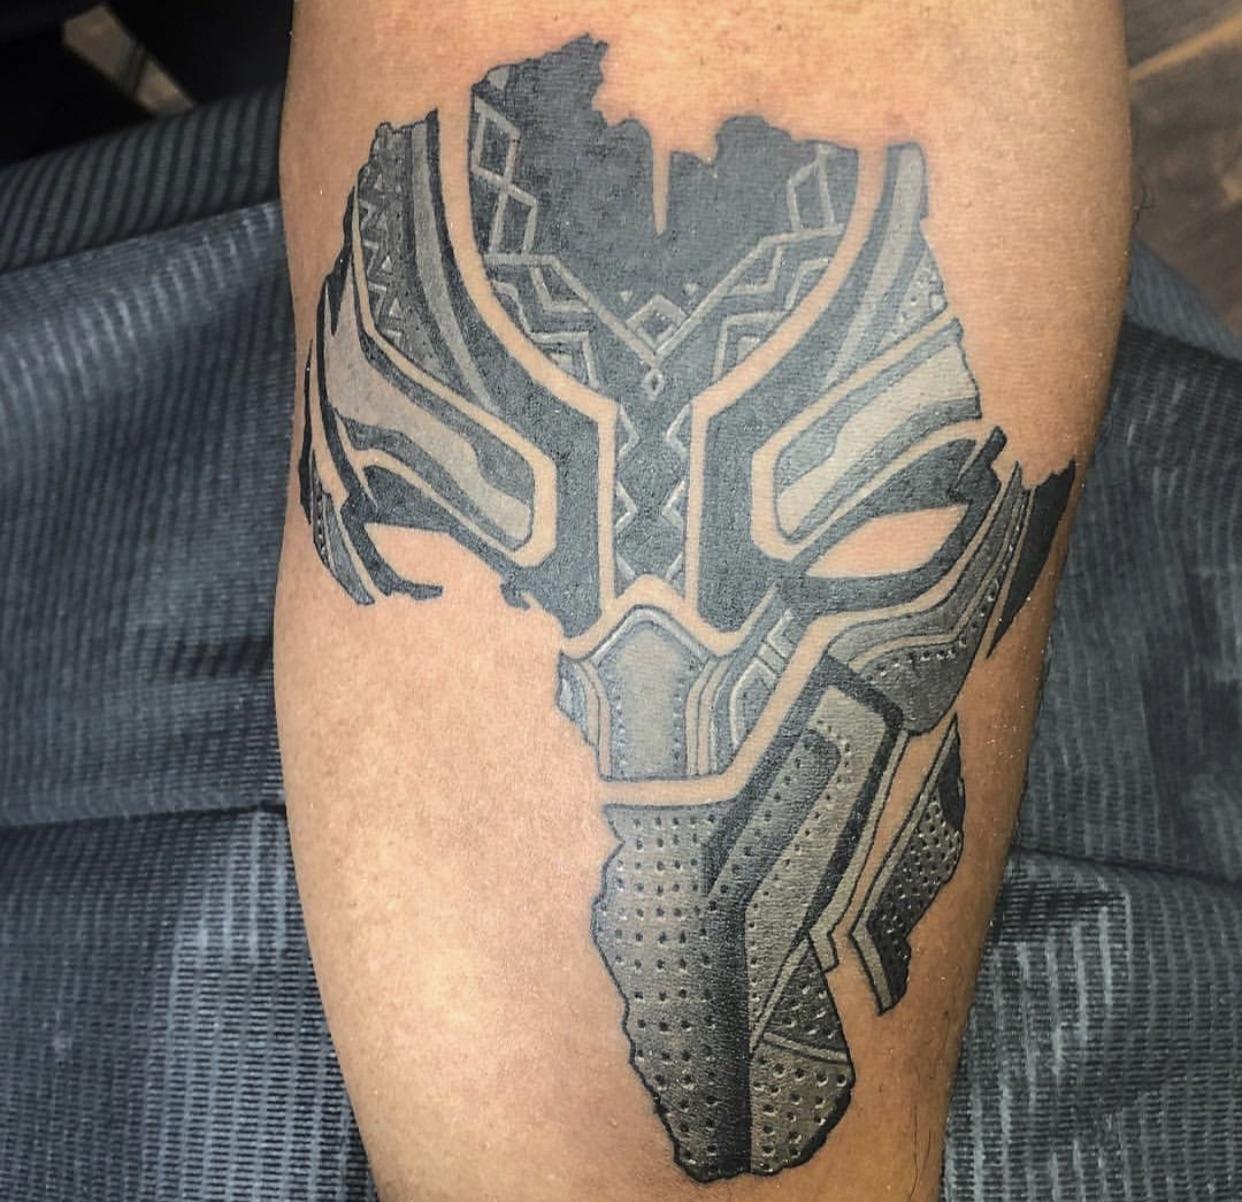 This Black Panther Tattoo Panther Tattoo Black Panther Tattoo Black Tattoos